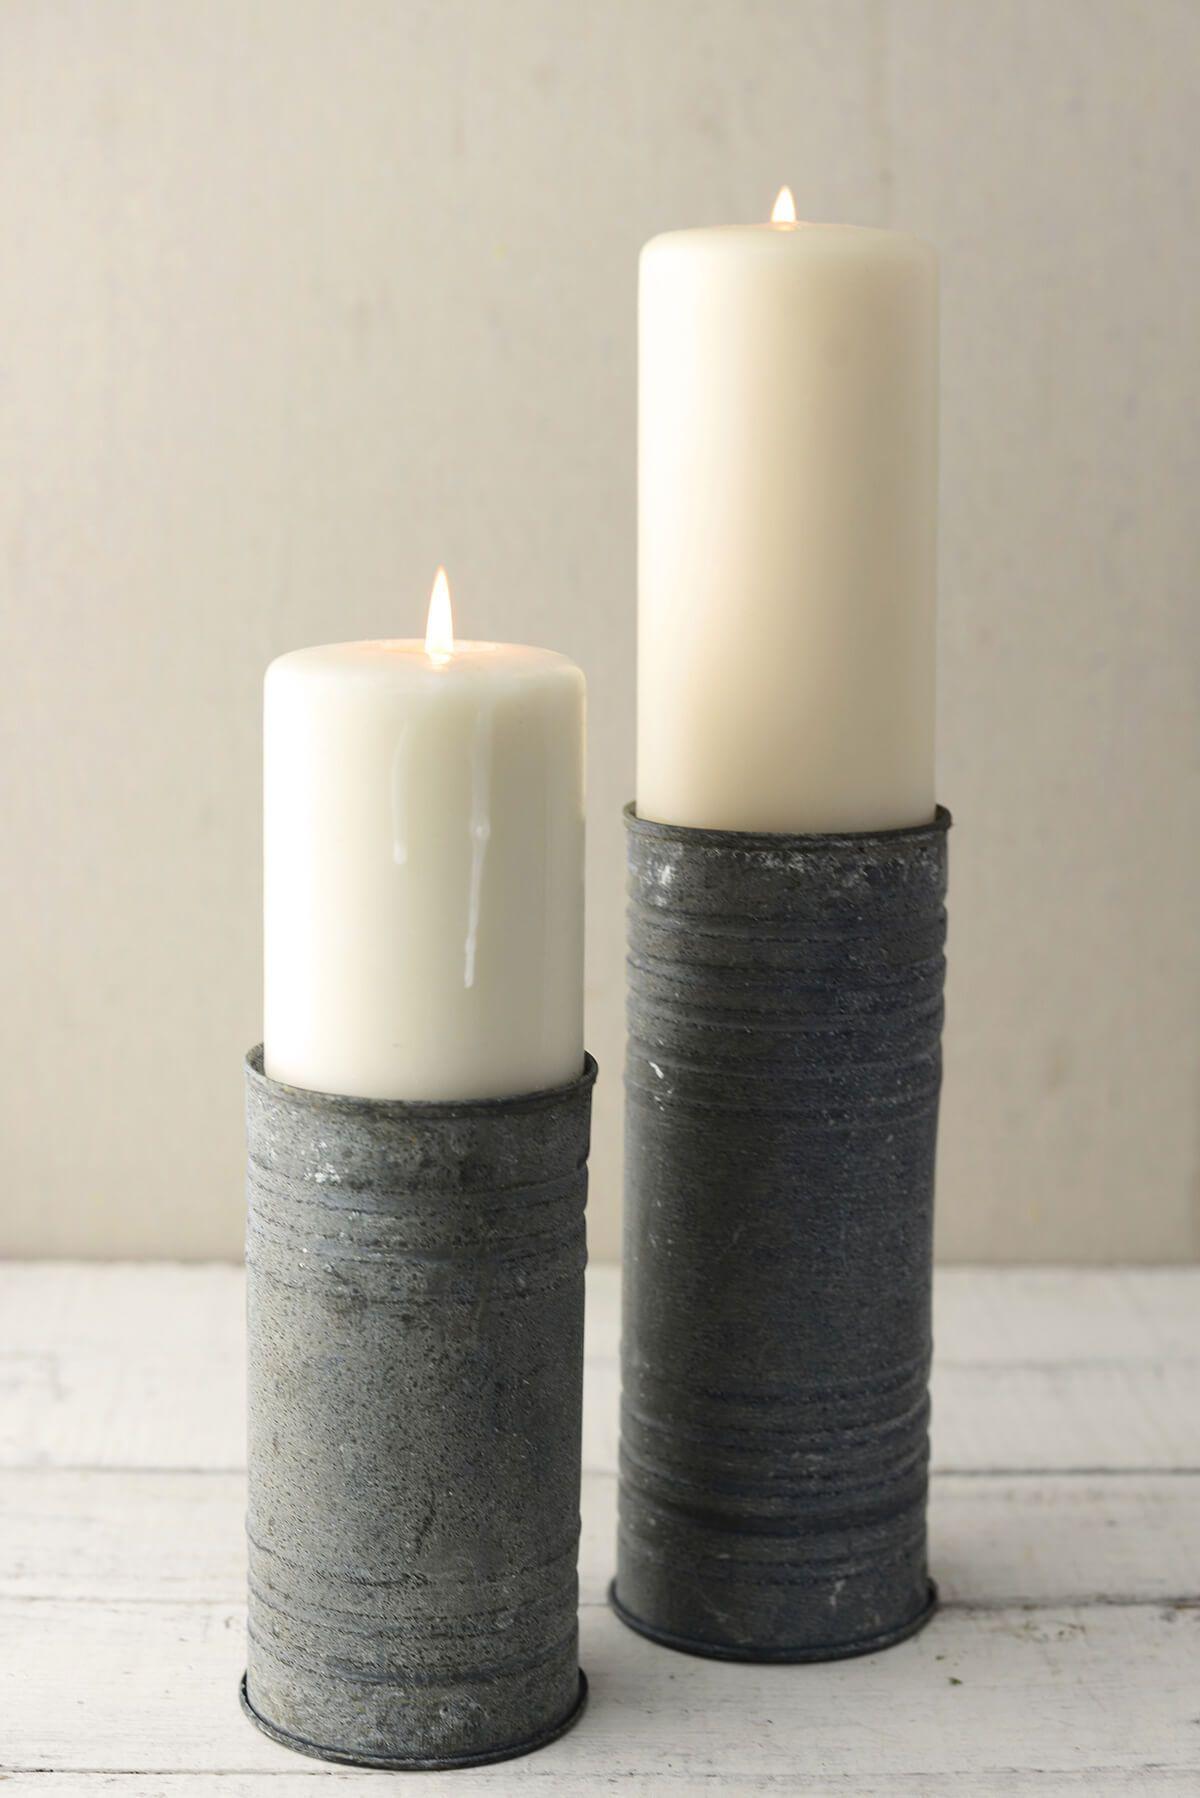 Zinc Cylinder Vase & Pillar Candle Holder